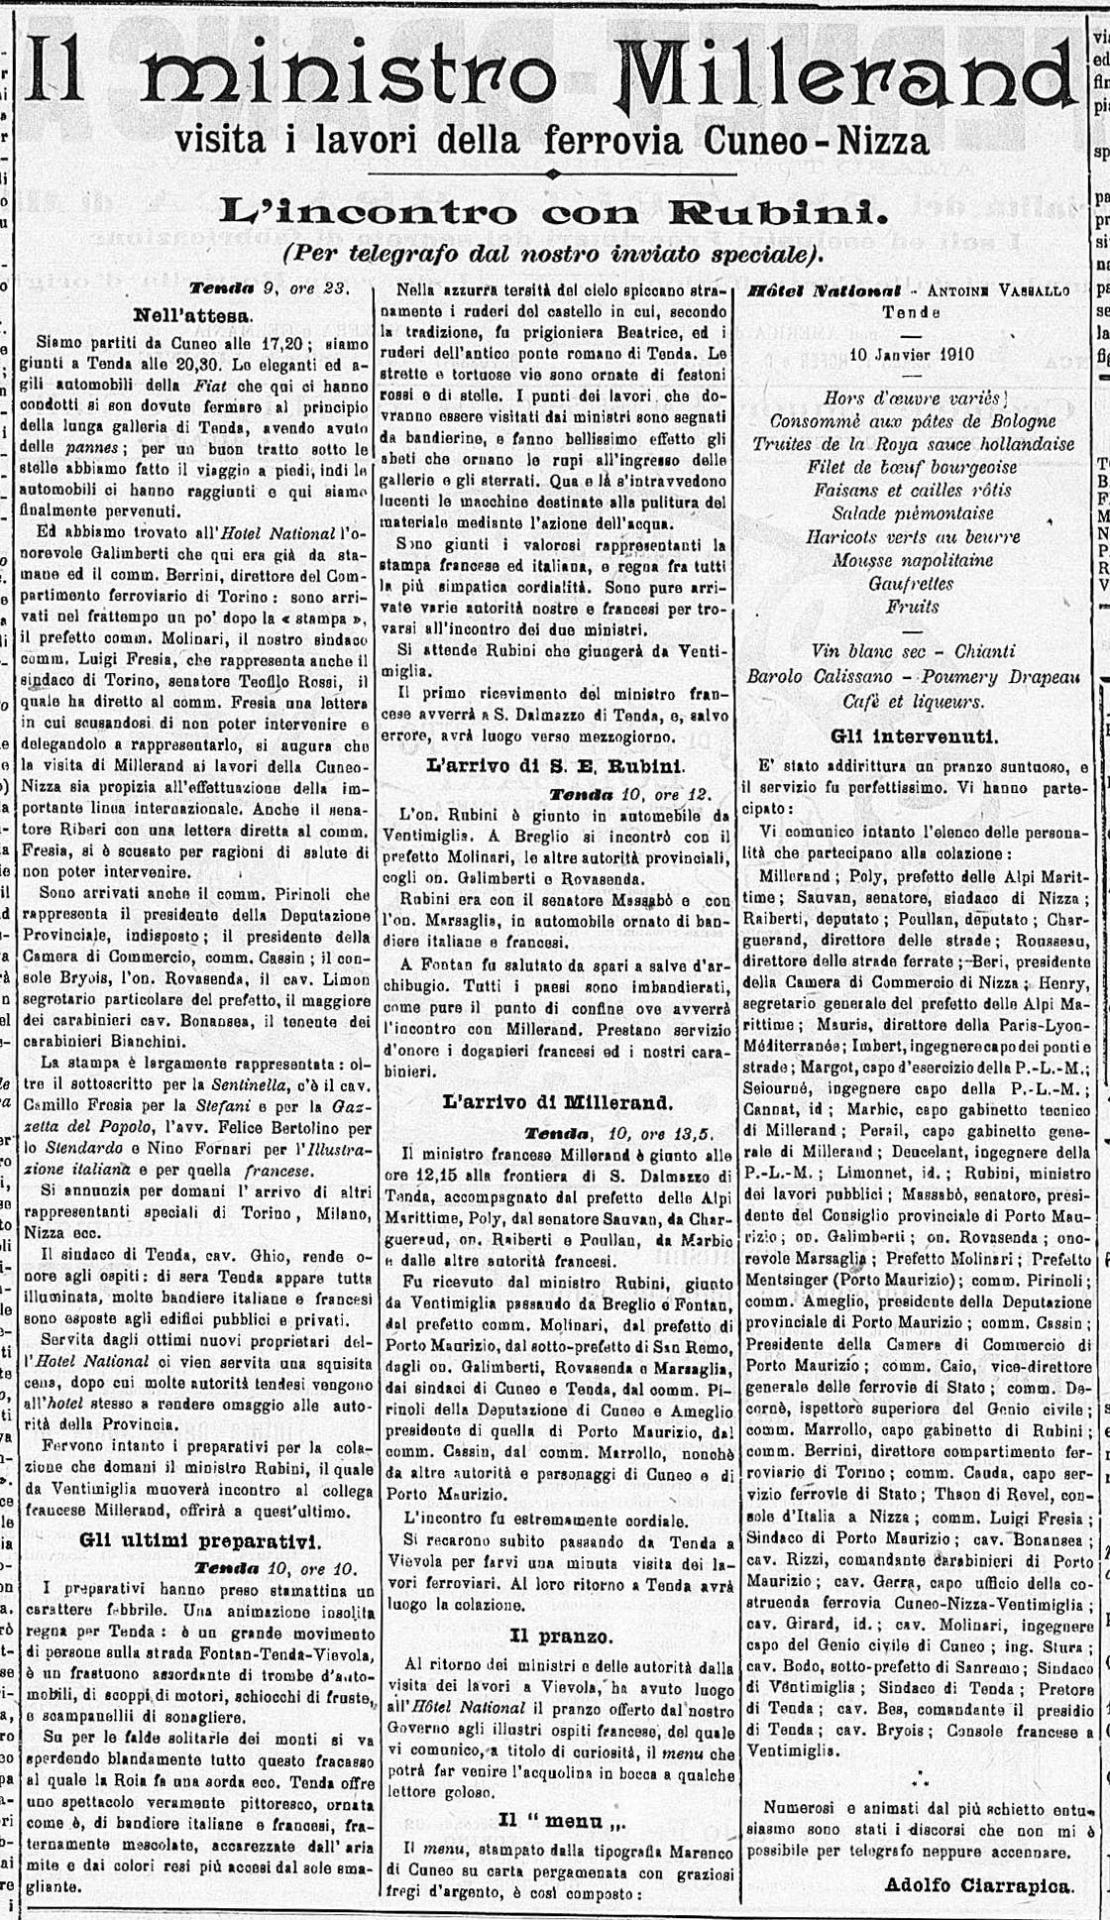 10 1 1910 n 6